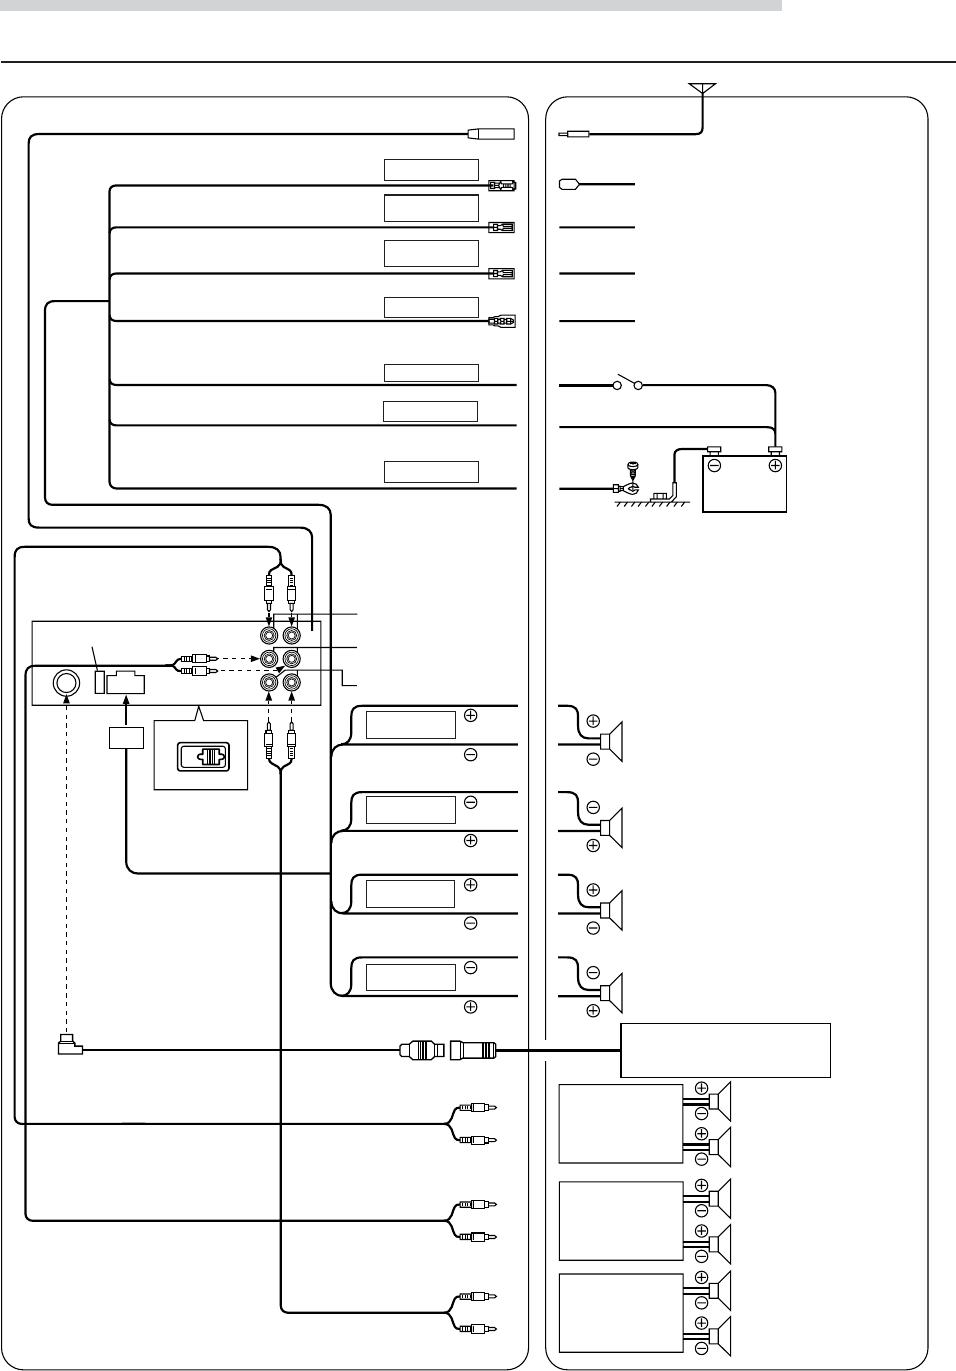 Alpine Cda 9847 Users Manual Ip Fuse Panelcar Wiring Diagram 30 En